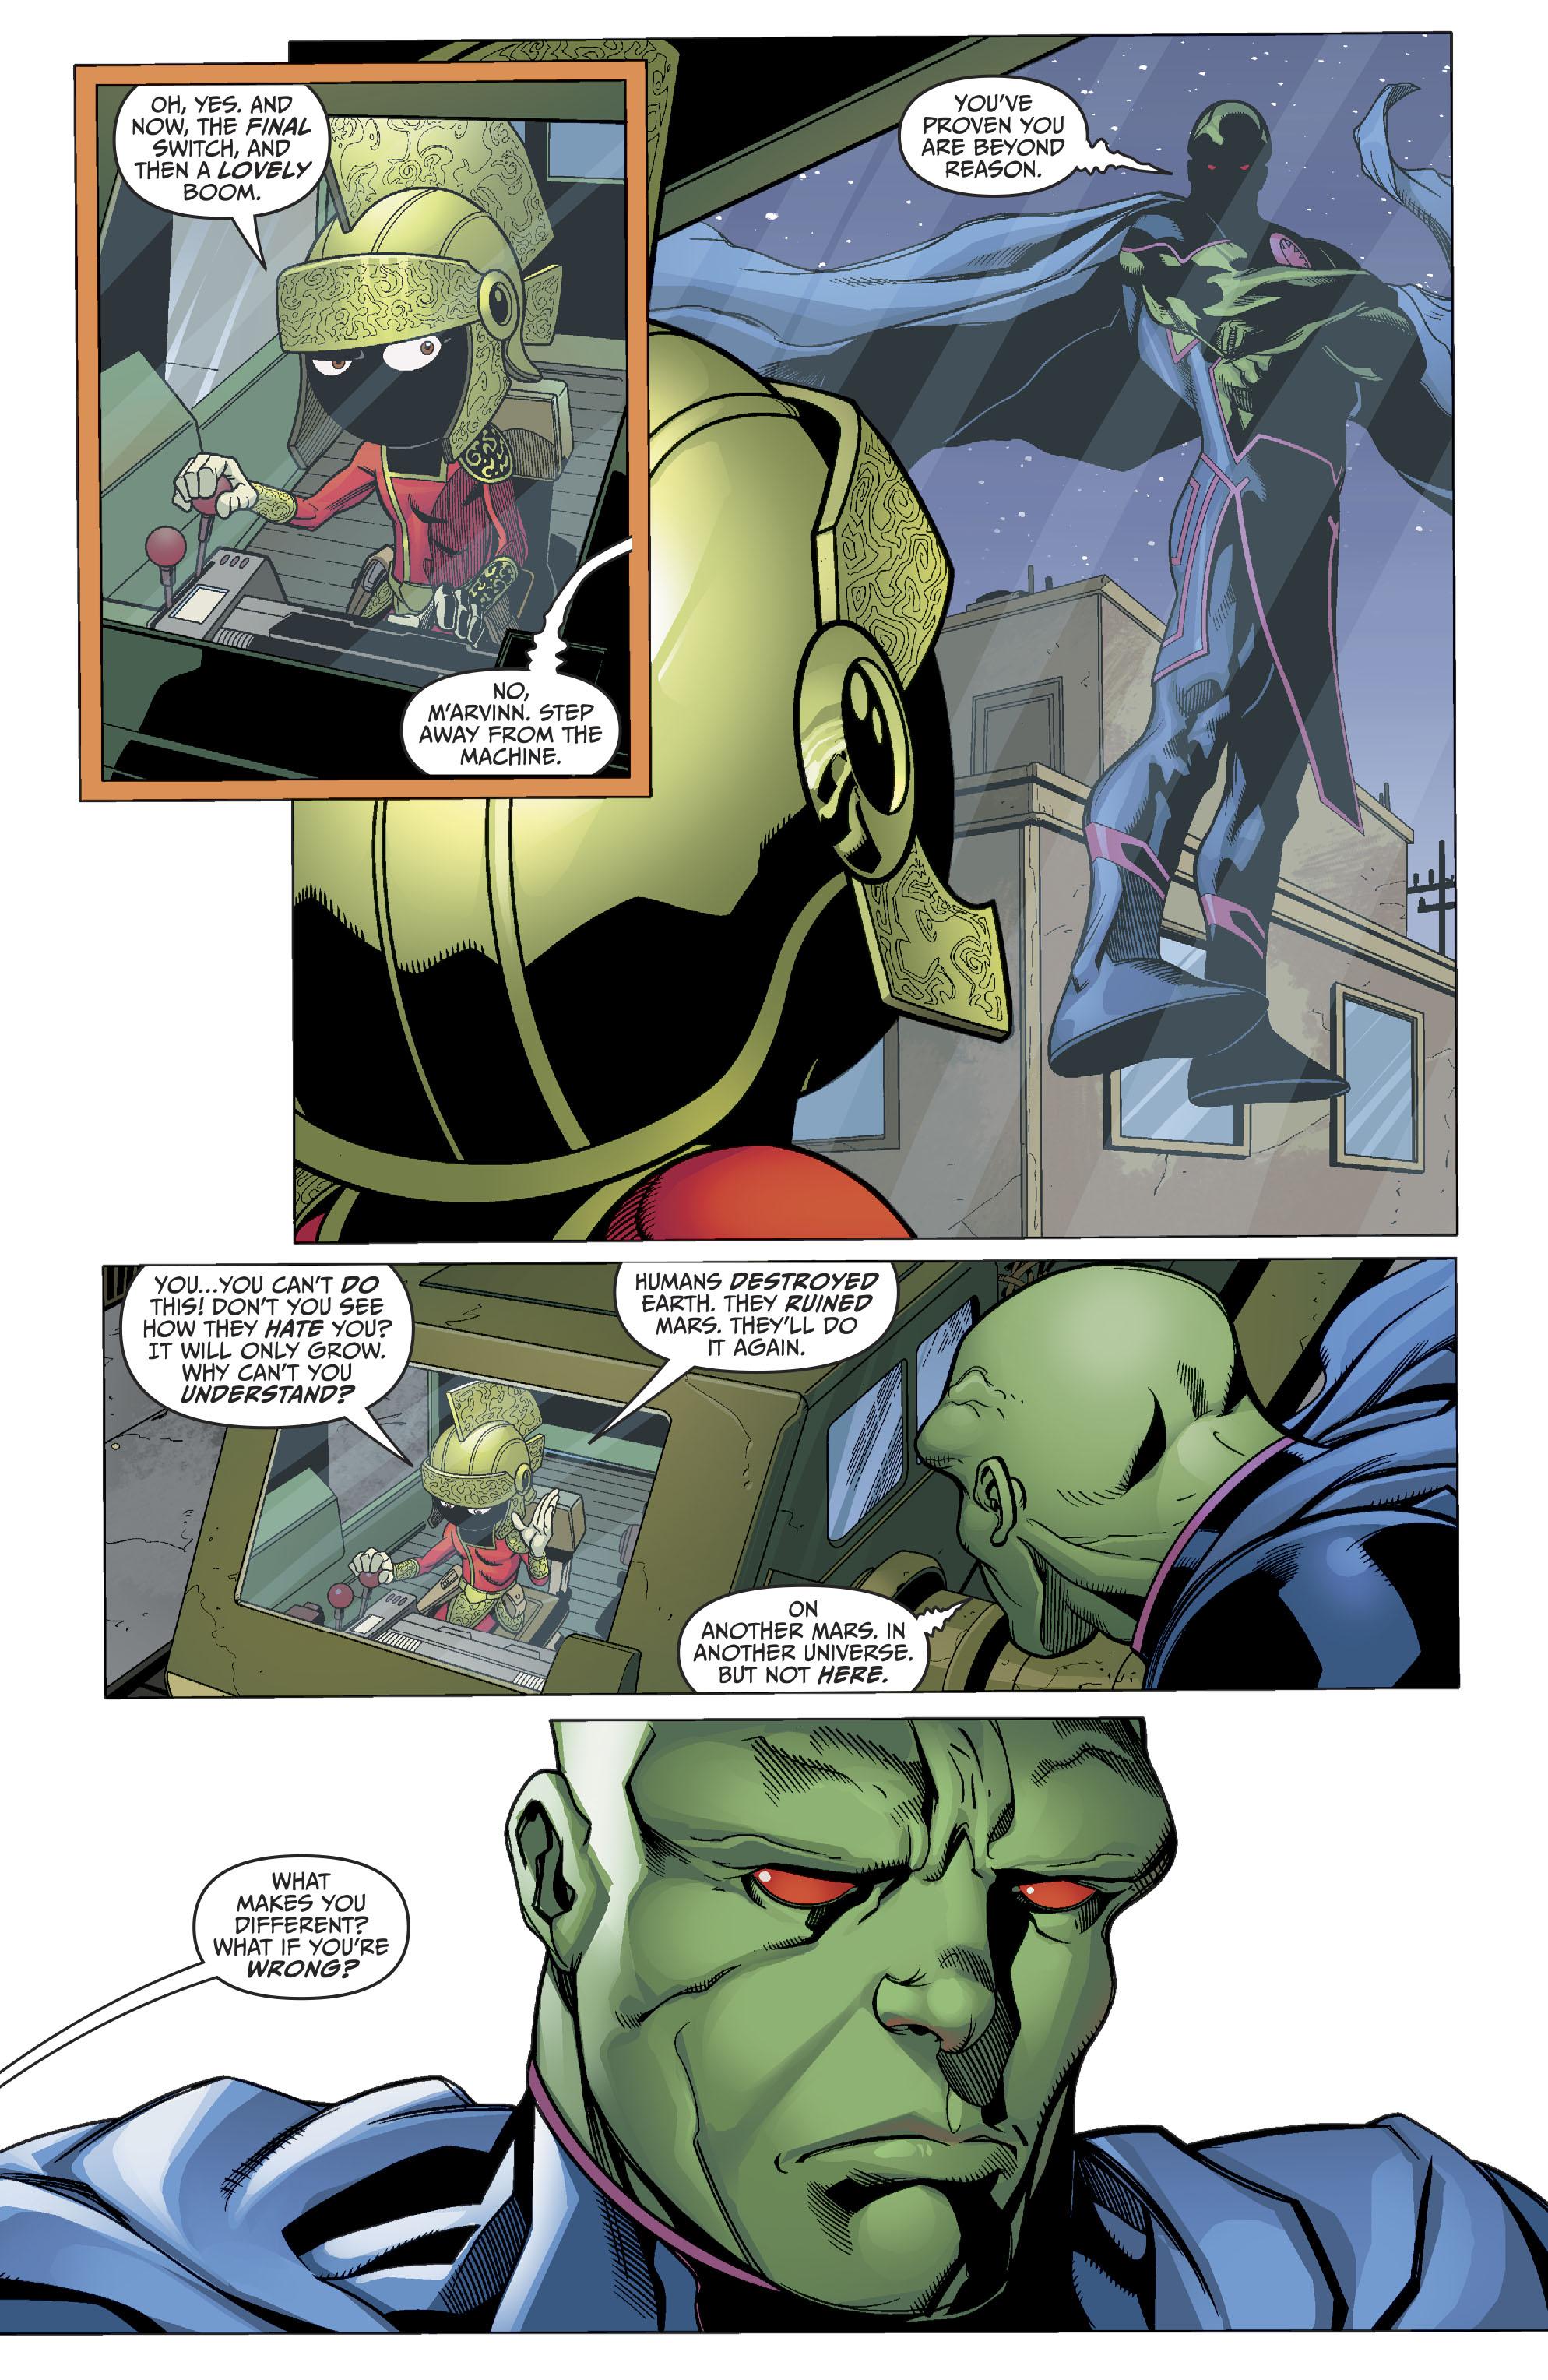 Read online Martian Manhunter/Marvin the Martian Special comic -  Issue # Full - 26